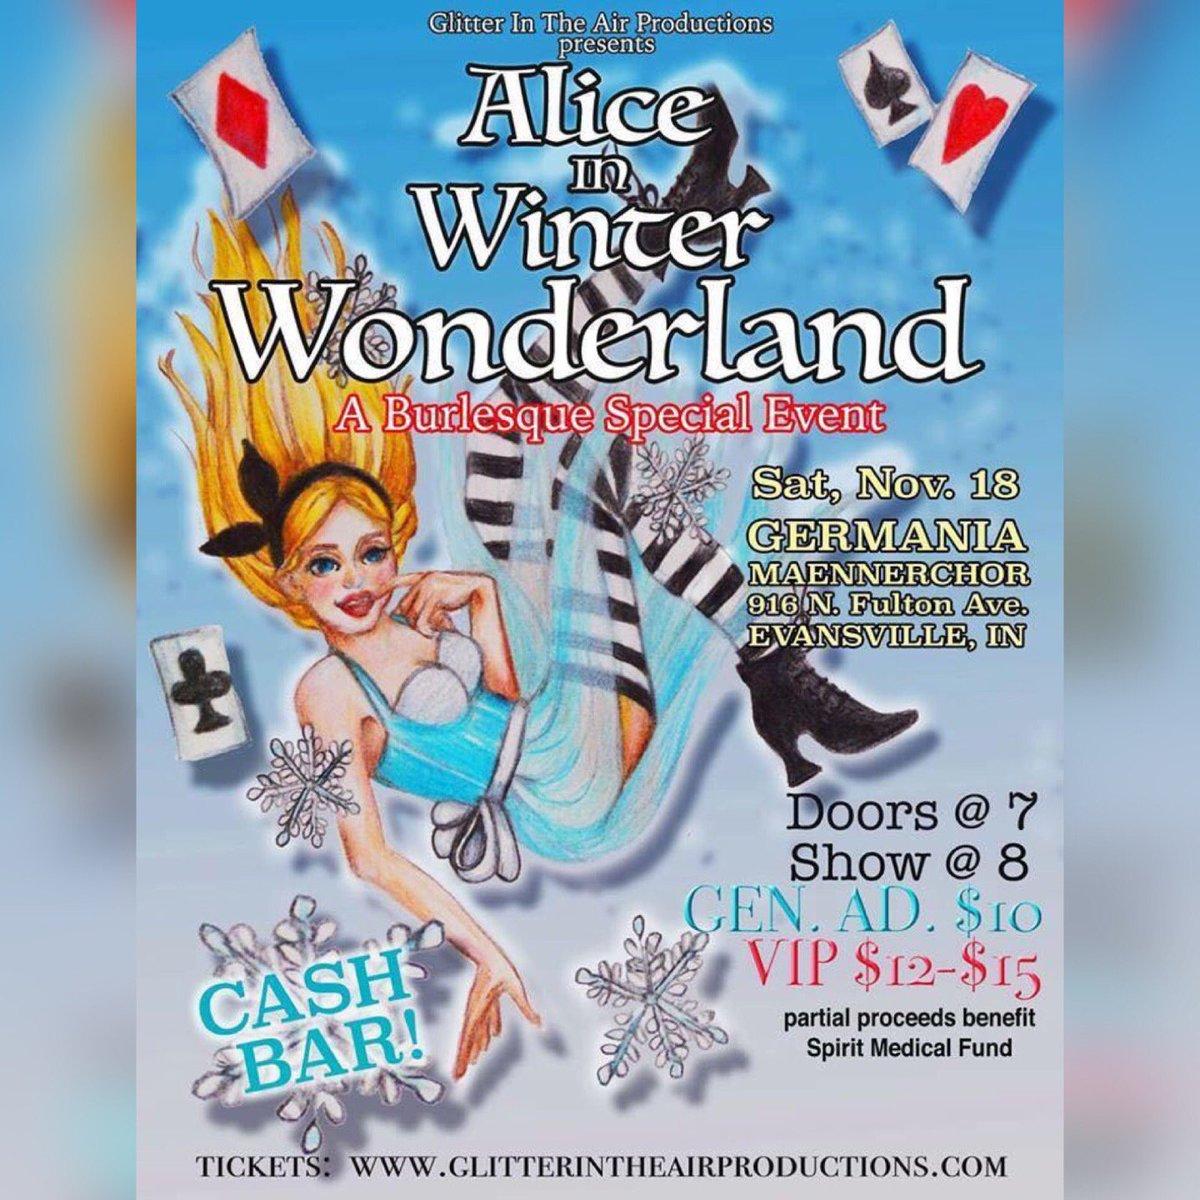 Show time! ( Germania Maennerchor in Evansville, IN) 4H47HSkeE8 DVDA3DTNl